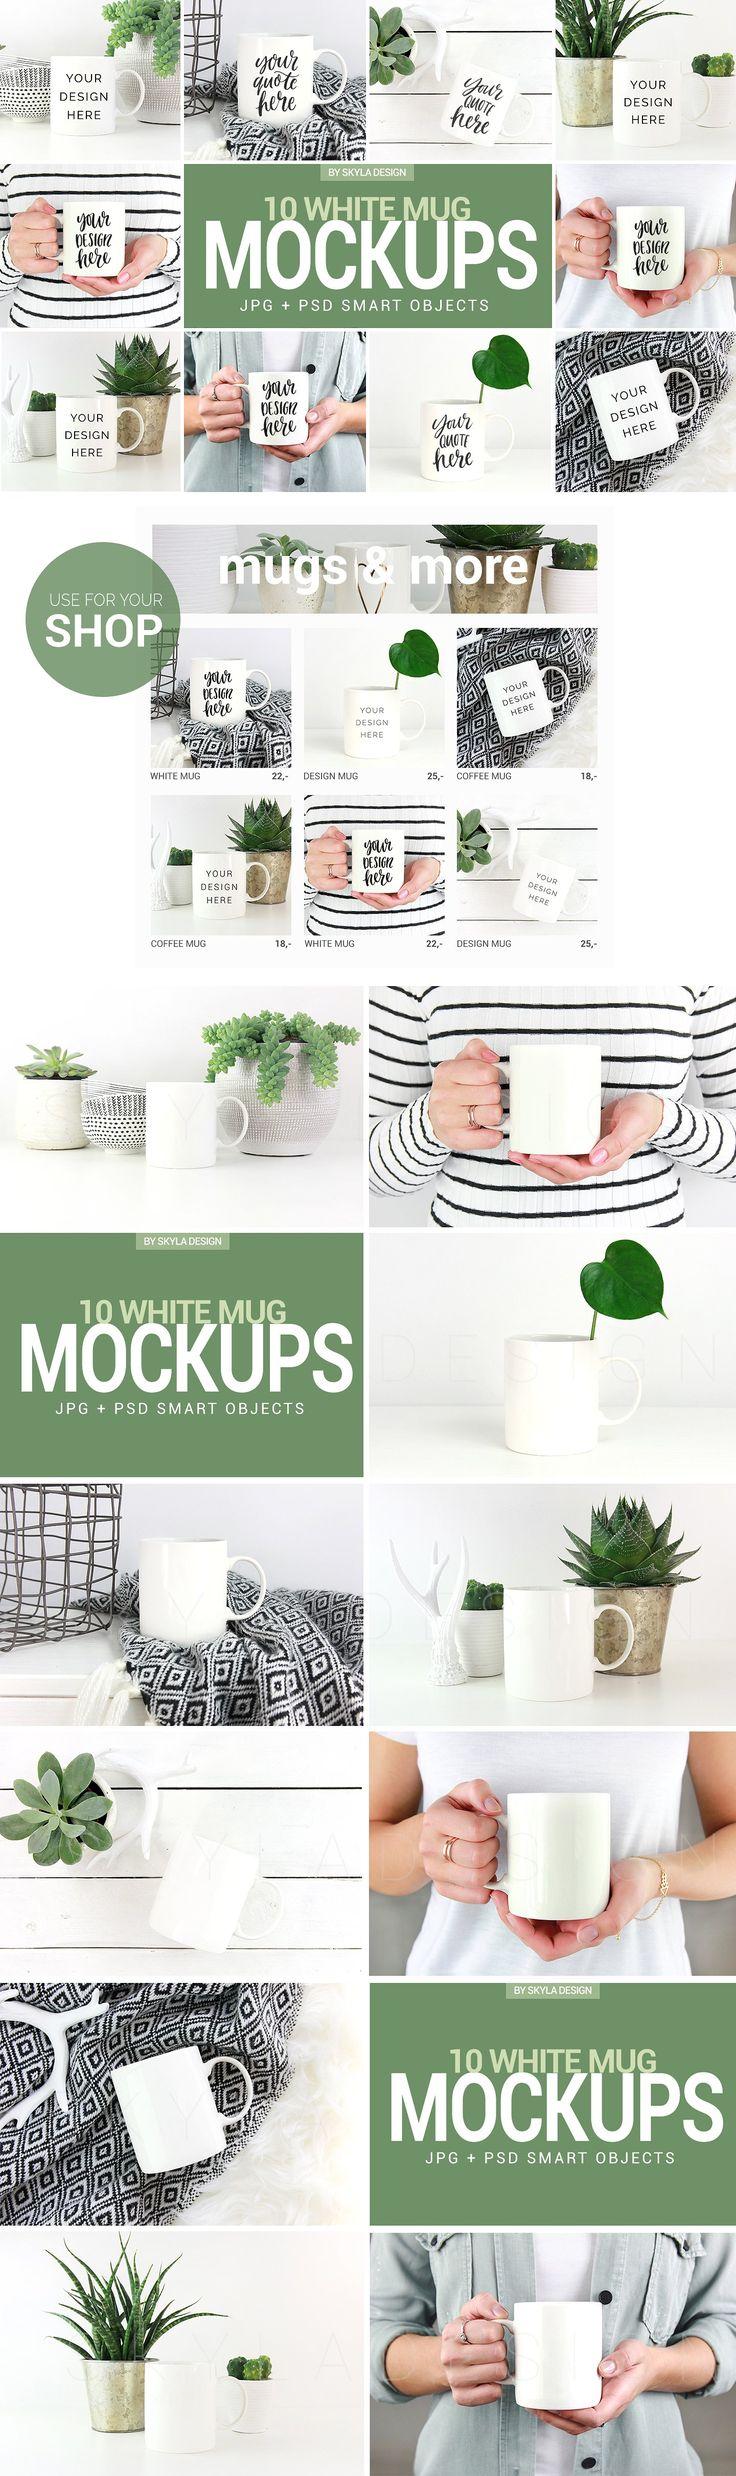 White coffee mug mockup photos ~ Product Mockups on Creative Market